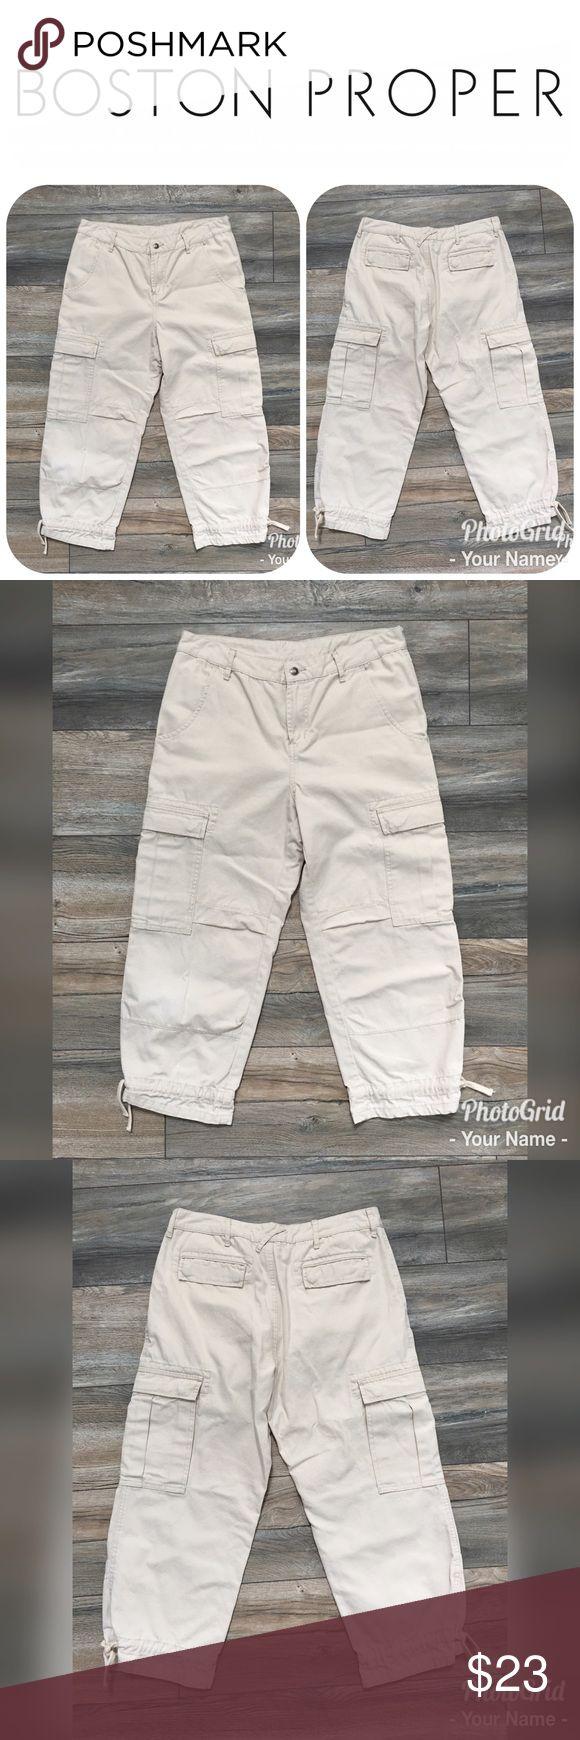 "LIKE NEW BOSTON PROPER Khaki Capri Pants Size 10 These are a pair of LIKE NEW BOSTON PROPER Khaki Capri Pants in a size 10.  The inseam is approximately 24"" and rise 10.5"".  These Khaki Capris are absolutely adorable and originally $49! Boston Proper Pants Capris"